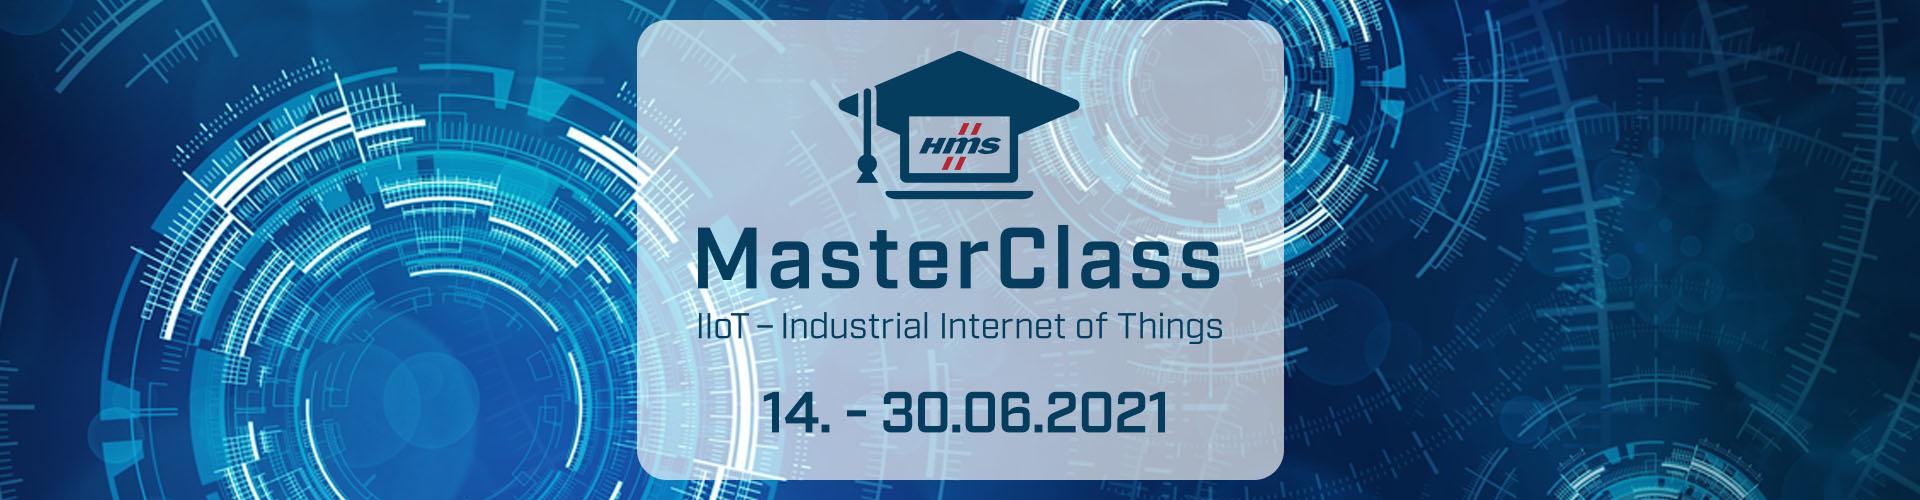 Header MasterClass Machine Builders 1920x500